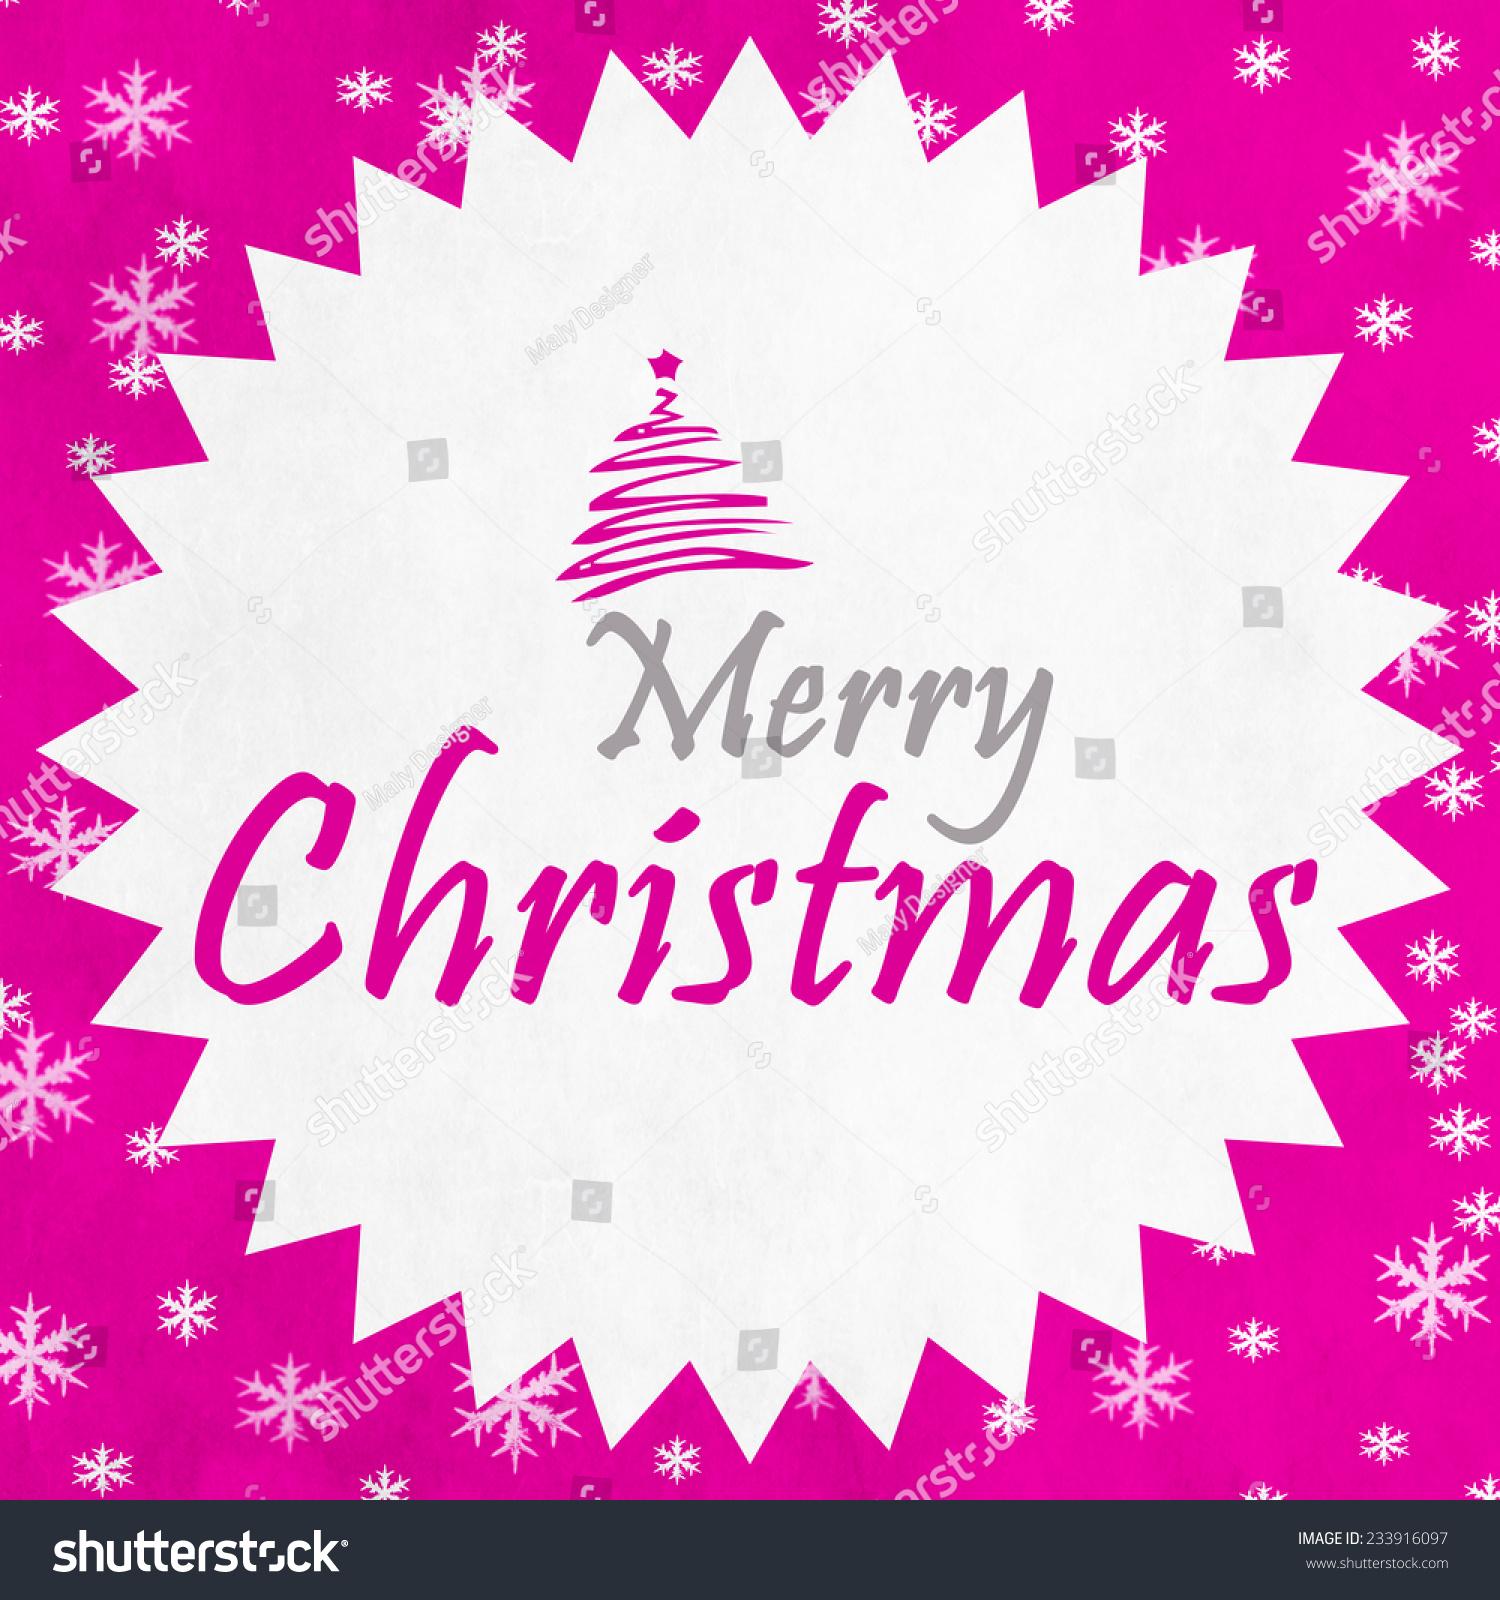 Merry Christmas Season Greetings Quote Stock Illustration 233916097